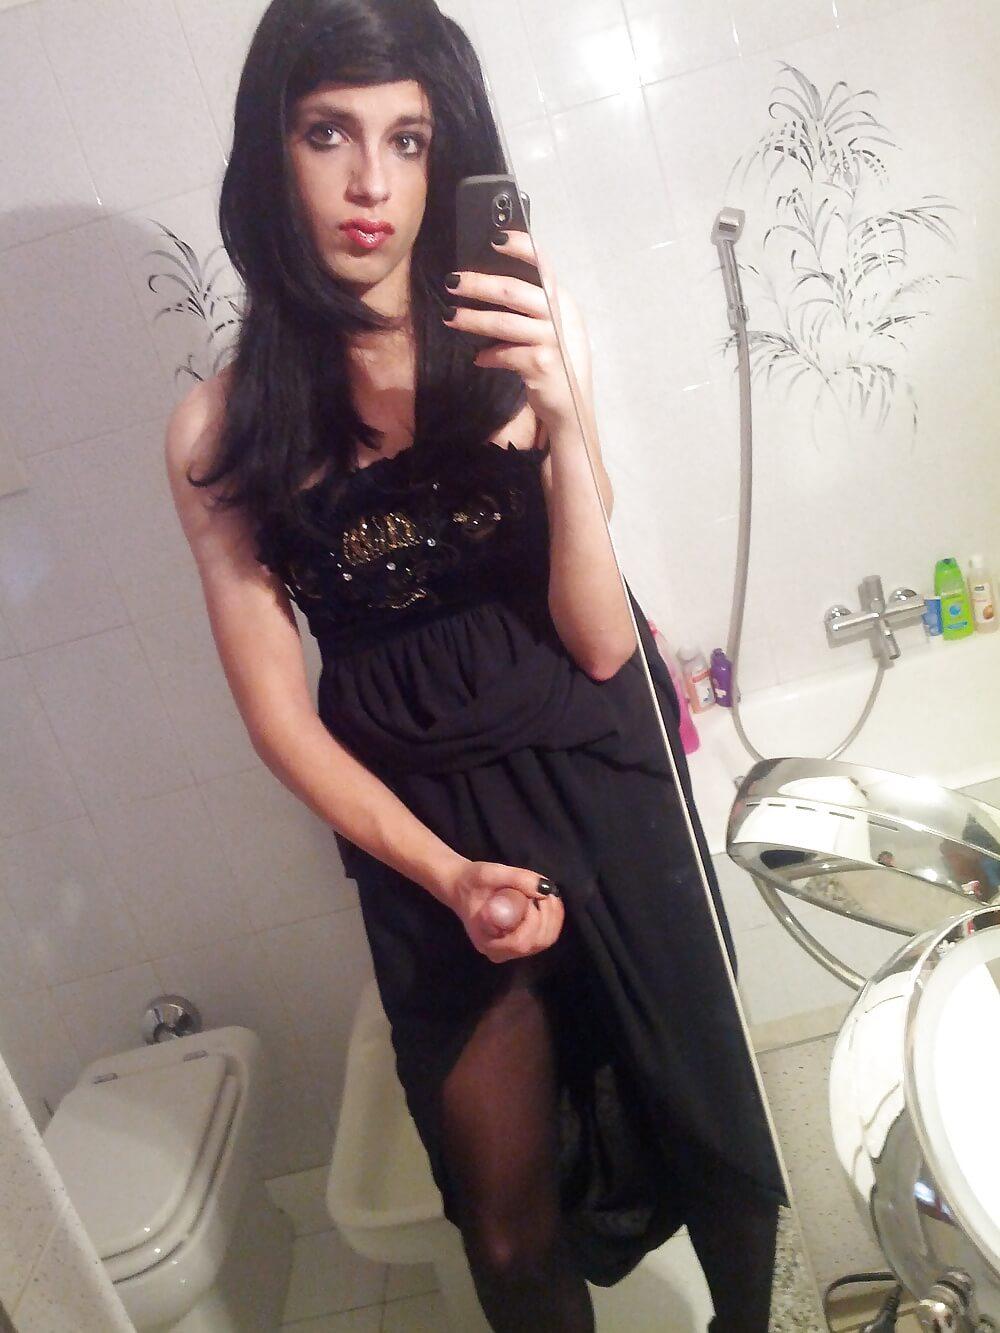 transvestite irene aoki selfie dick